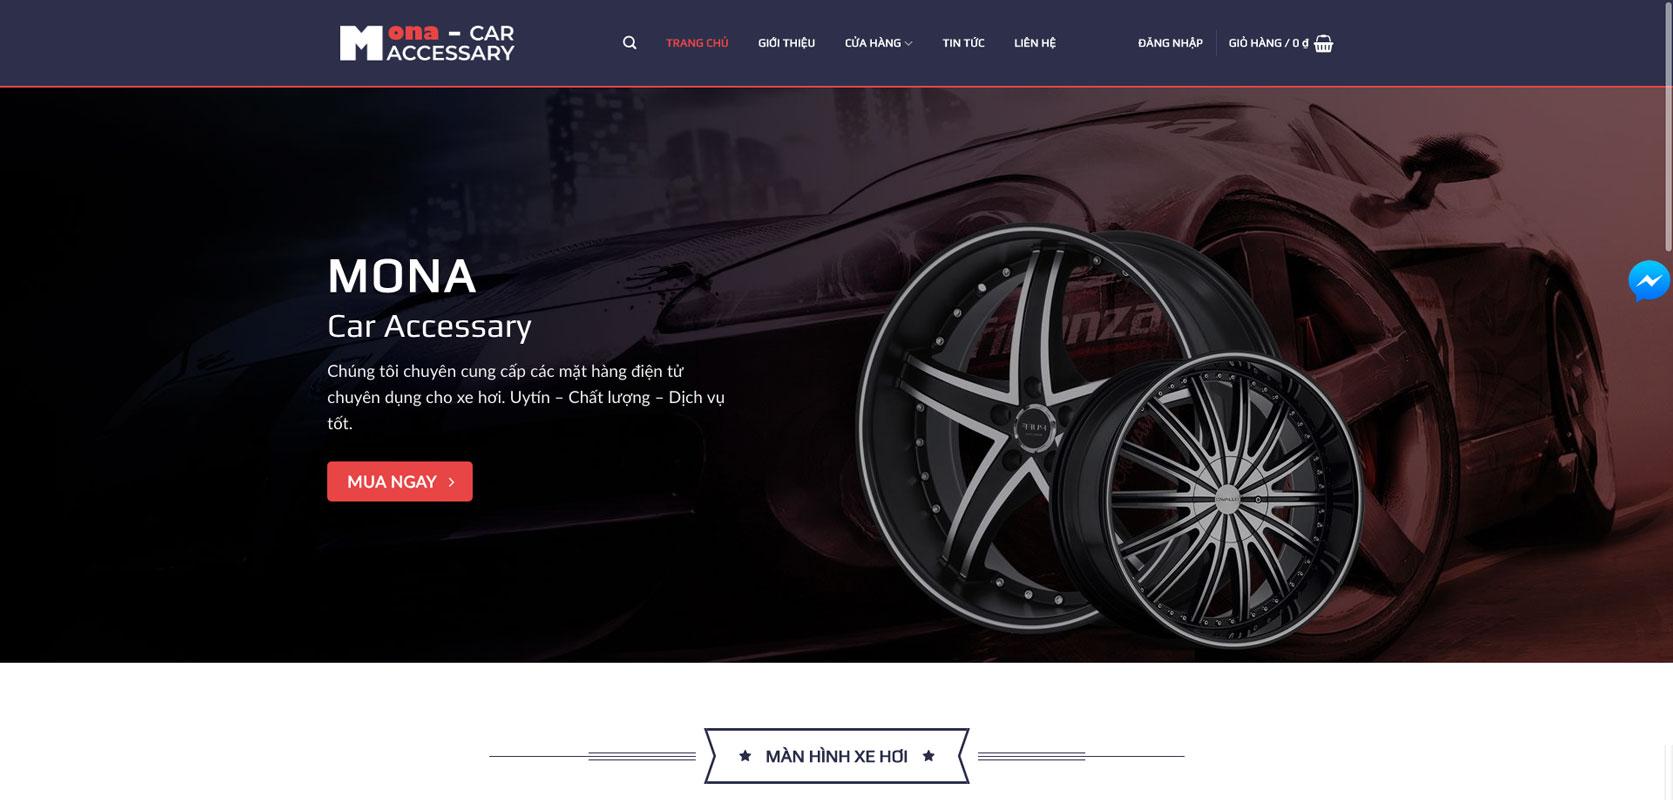 Website cho thuê xe